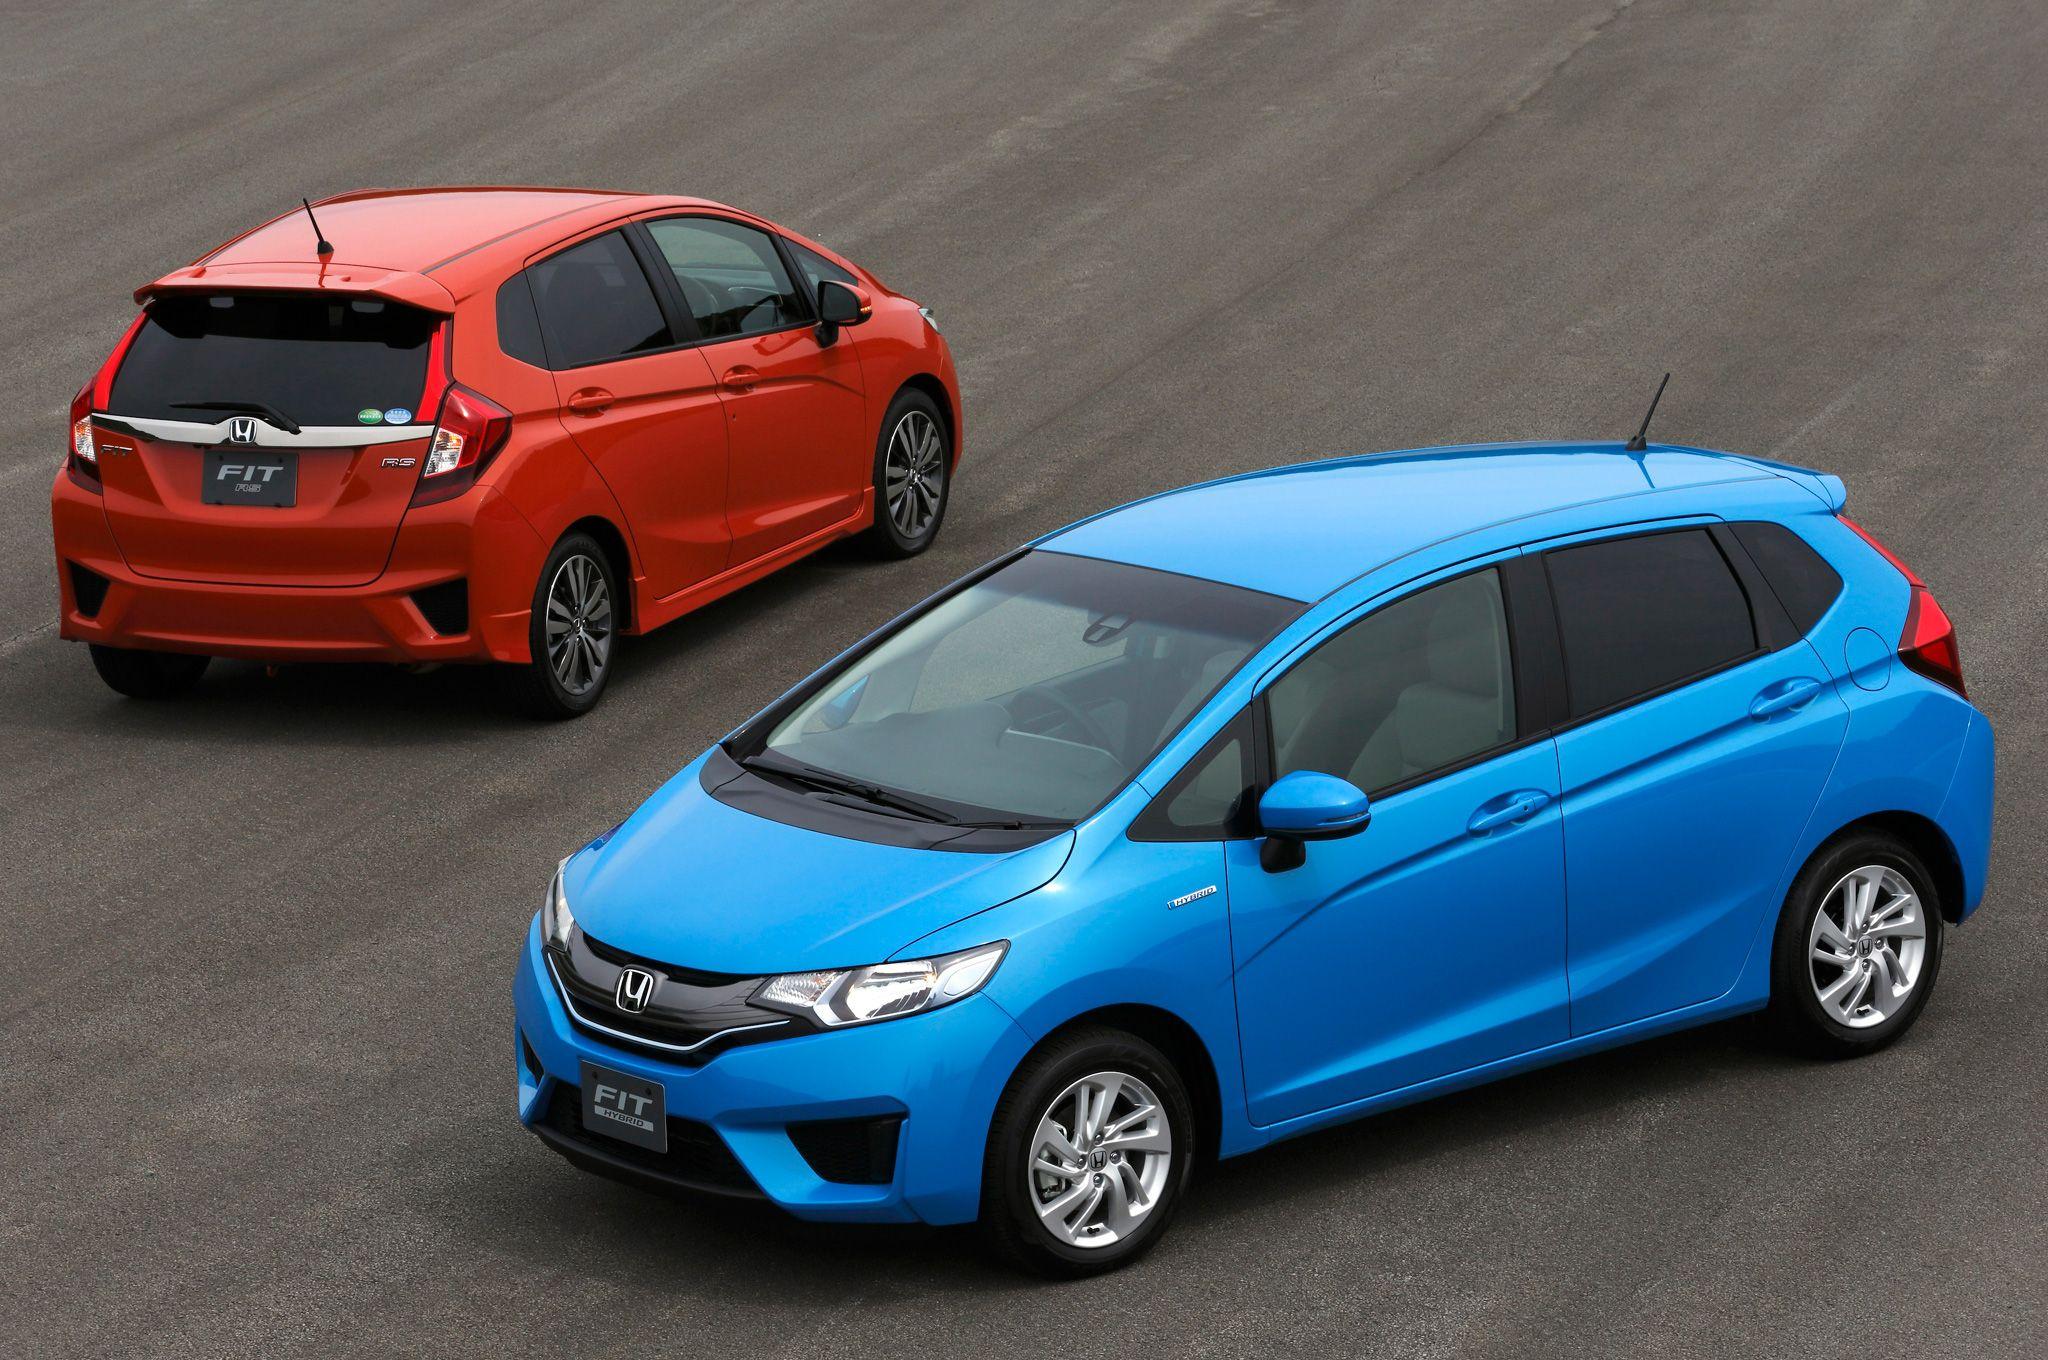 PHOTO: 2014 Honda Fit Blue and Orange #honda #hondafit #compactcar #hatchback